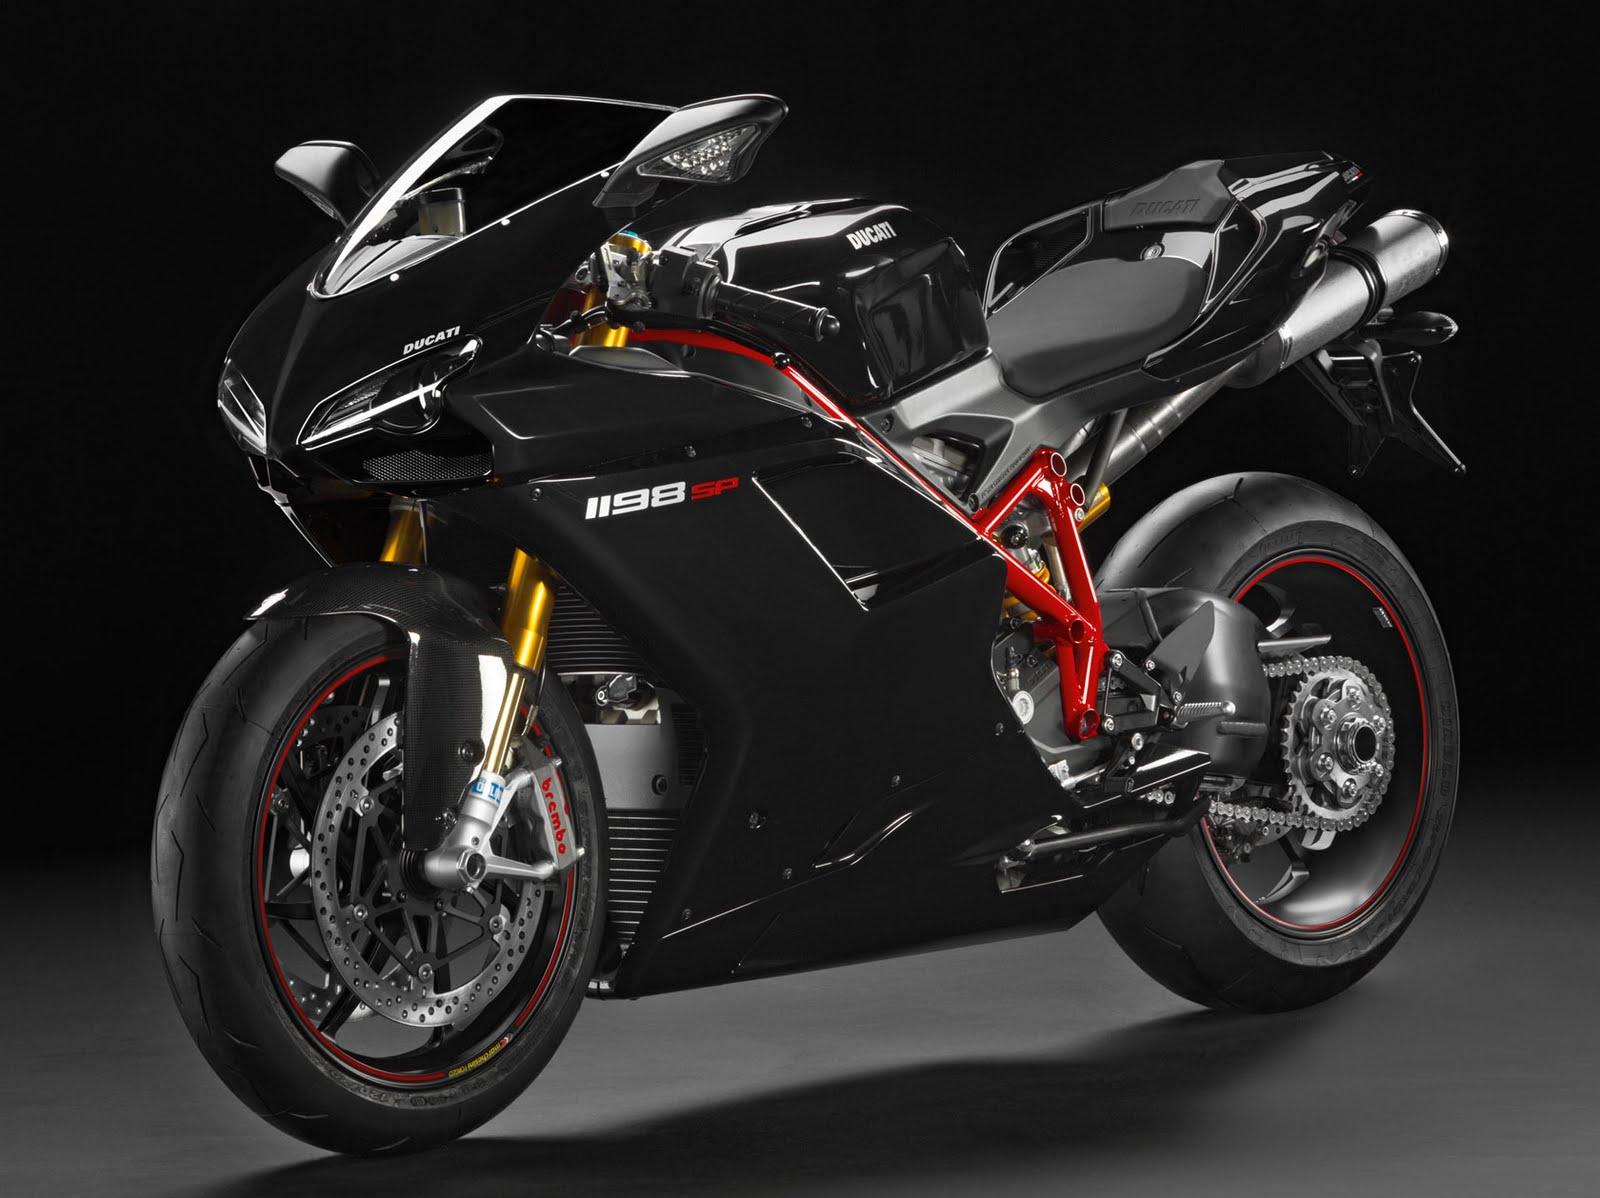 Top Motorcycle Wallpapers 2011 Ducati 1198SP Superbike 1600x1198